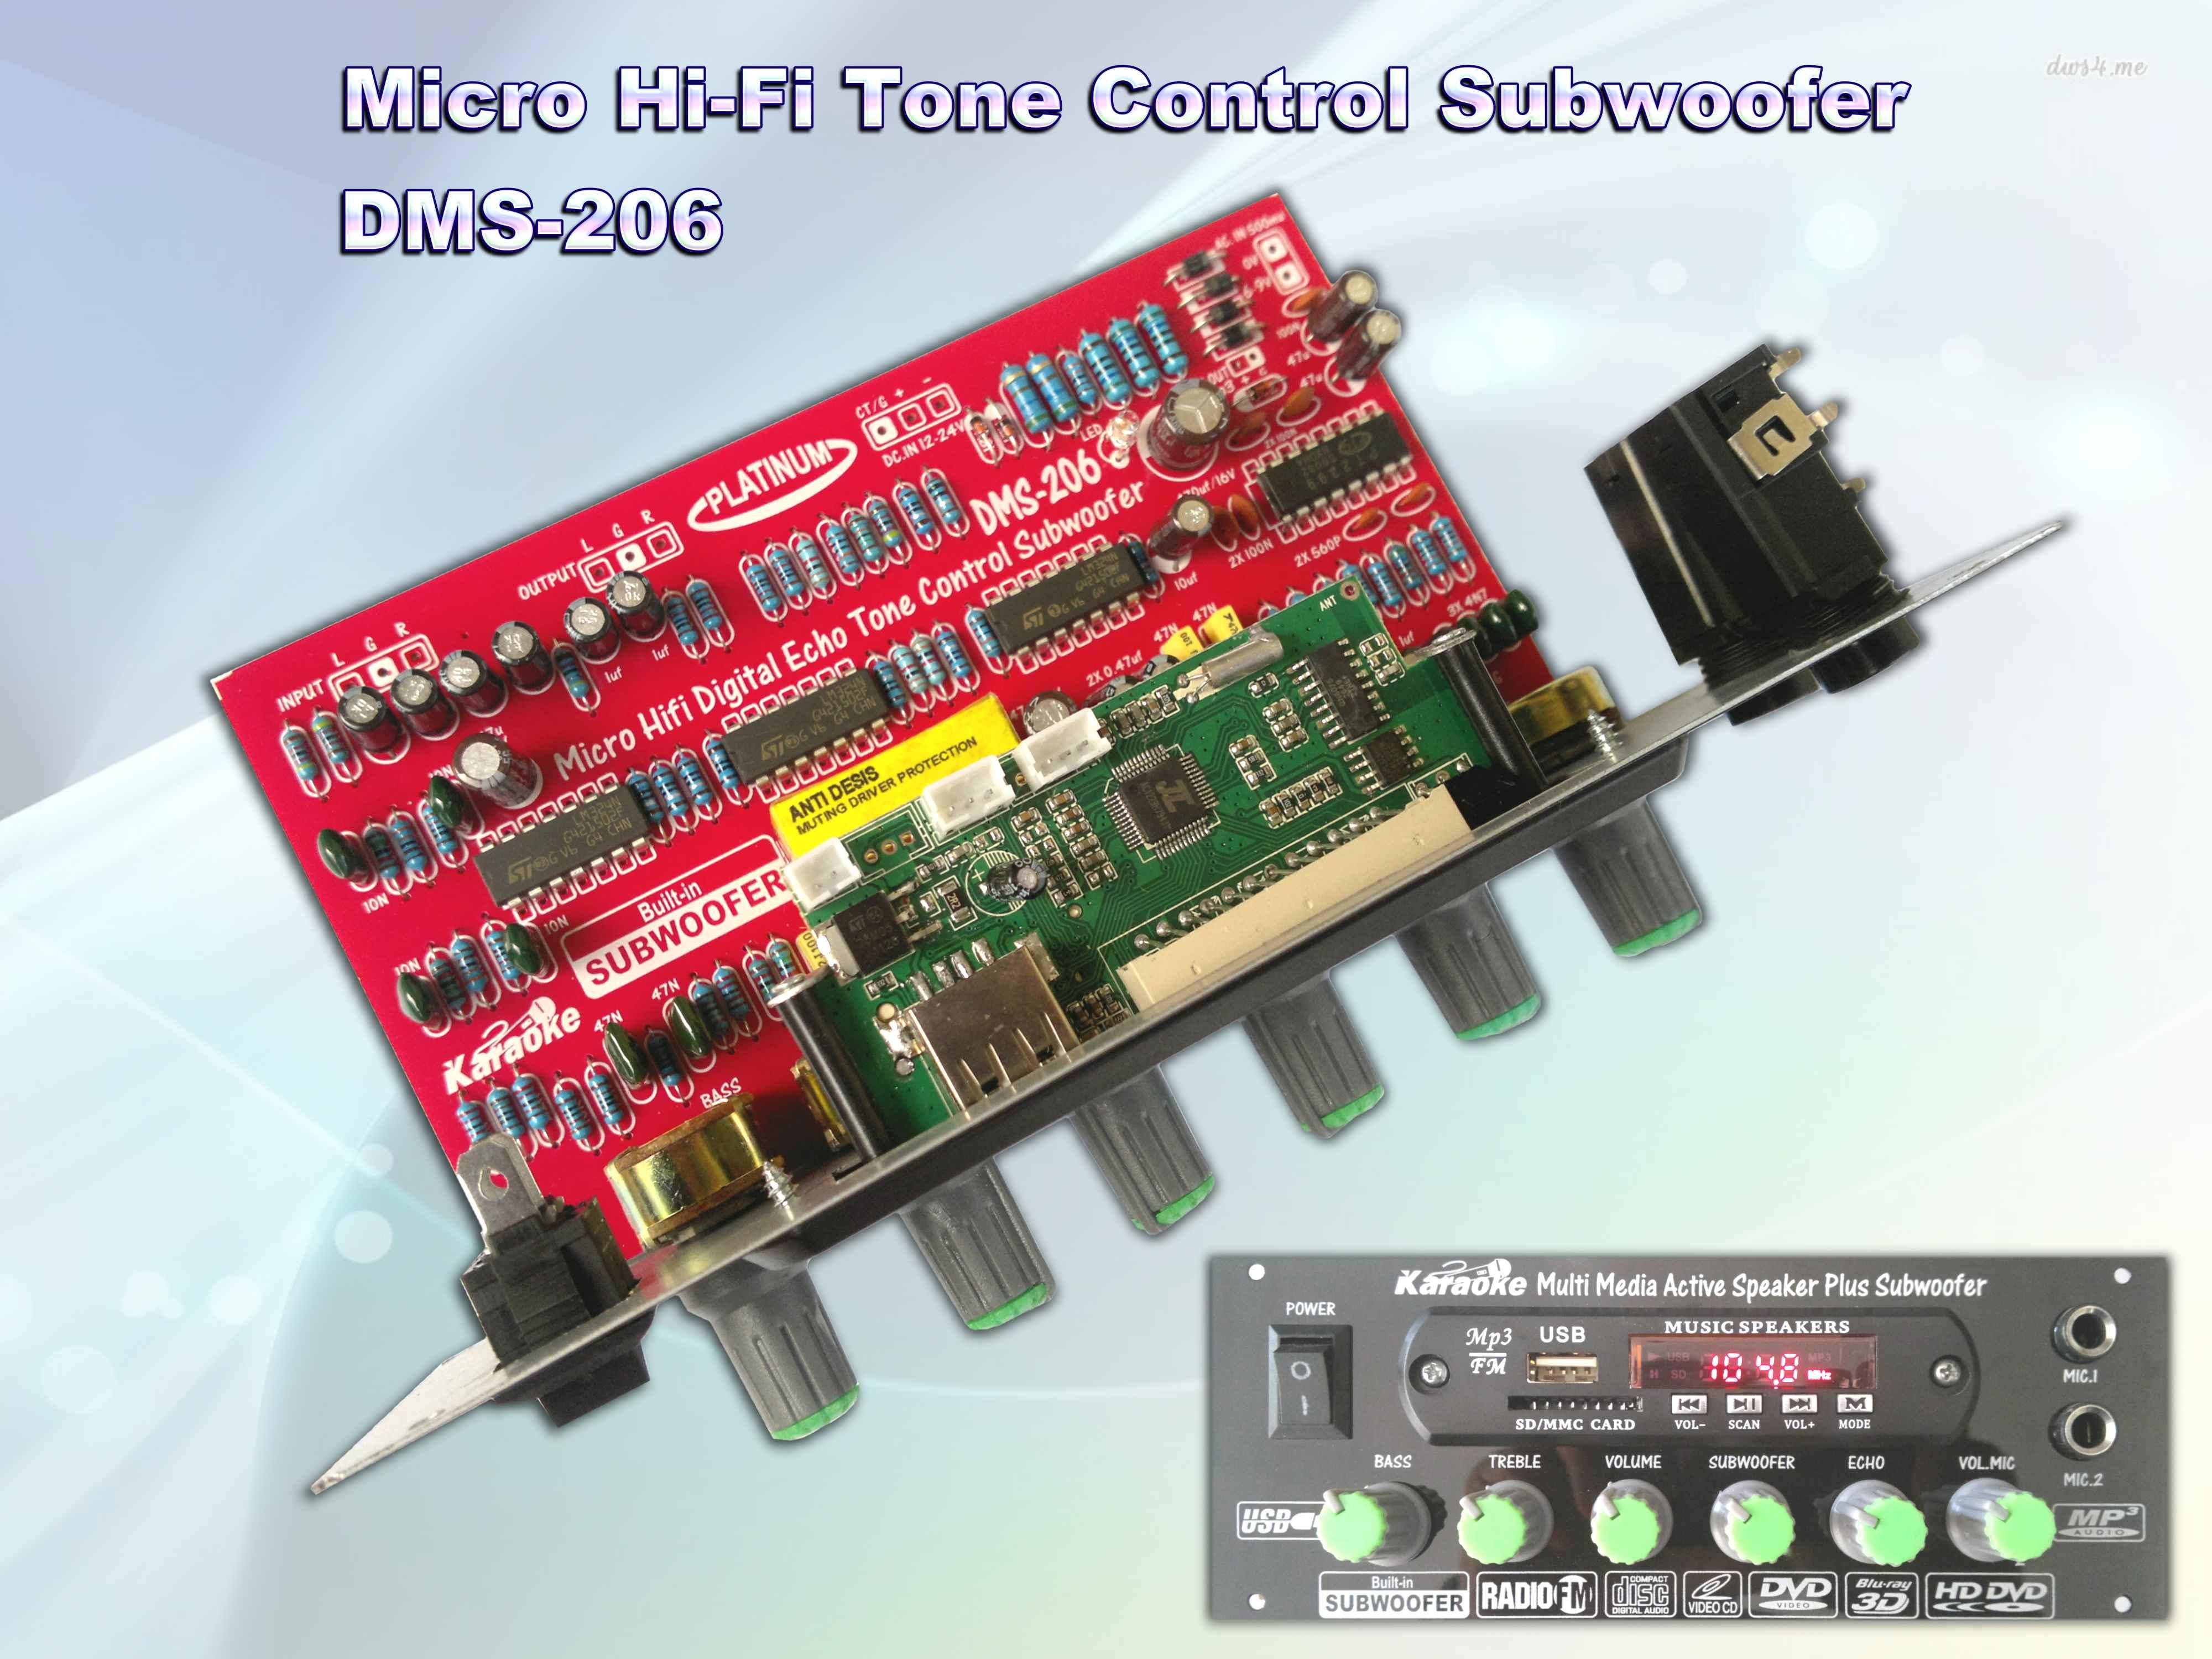 guitar amplifier wiring diagram aksesoris  mixer  tone control  dll audiobbm com let s  aksesoris  mixer  tone control  dll audiobbm com let s